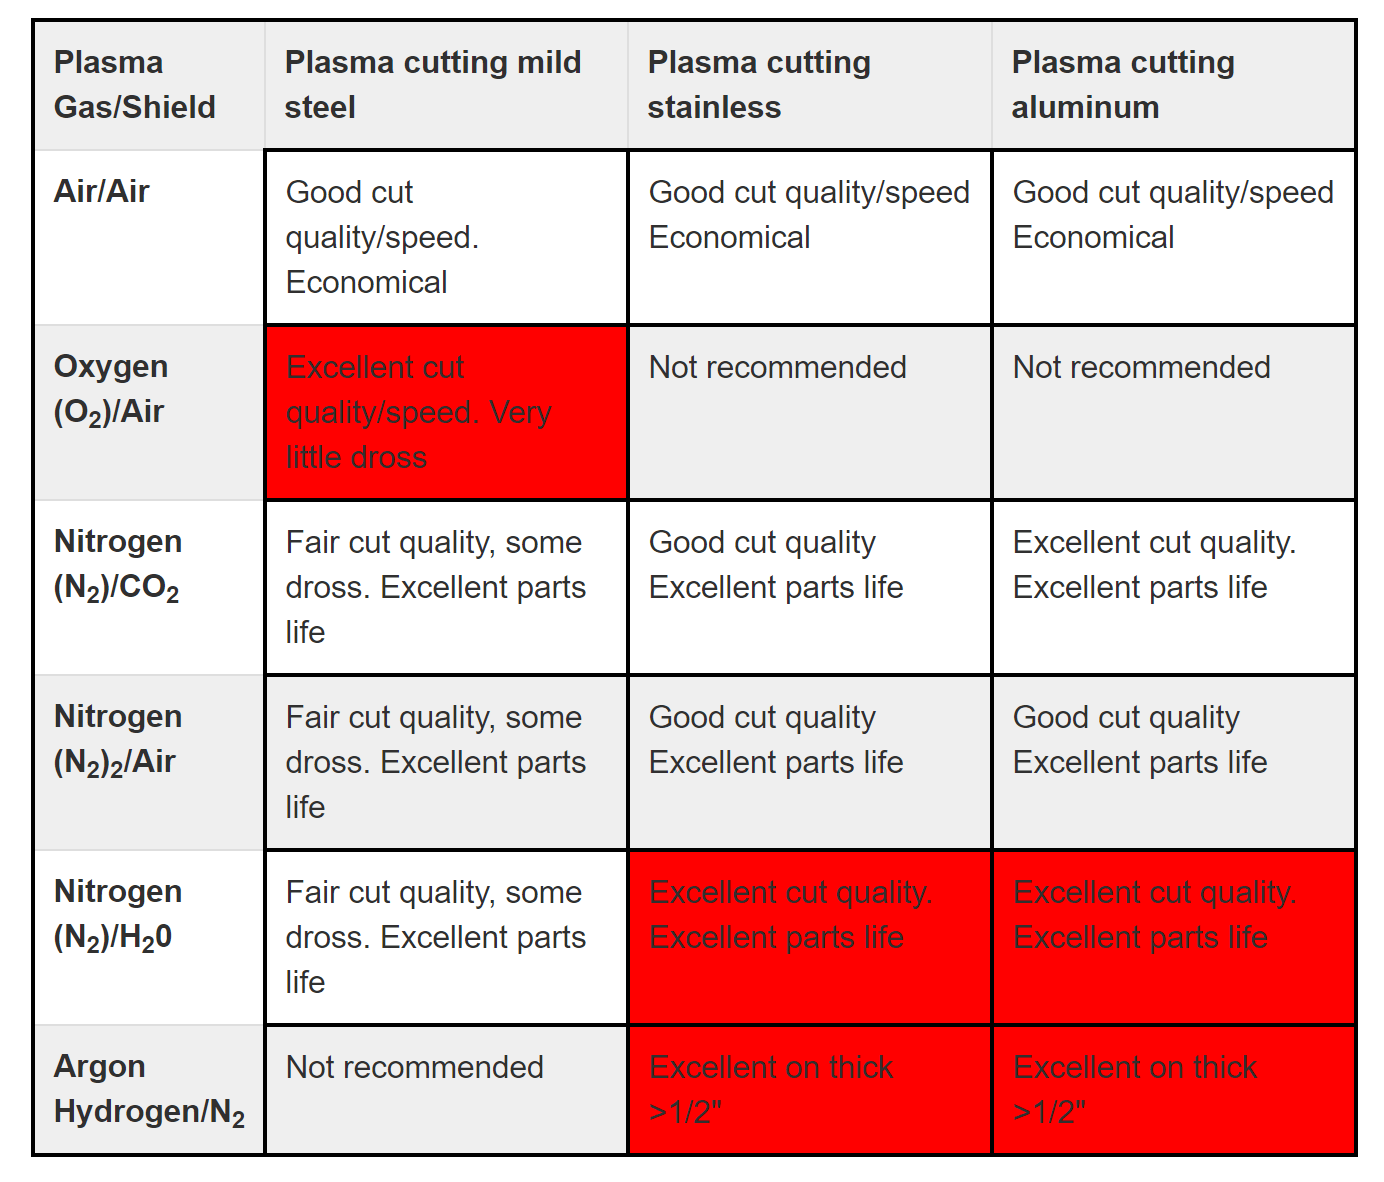 gas selection for plasma cutting aluminum